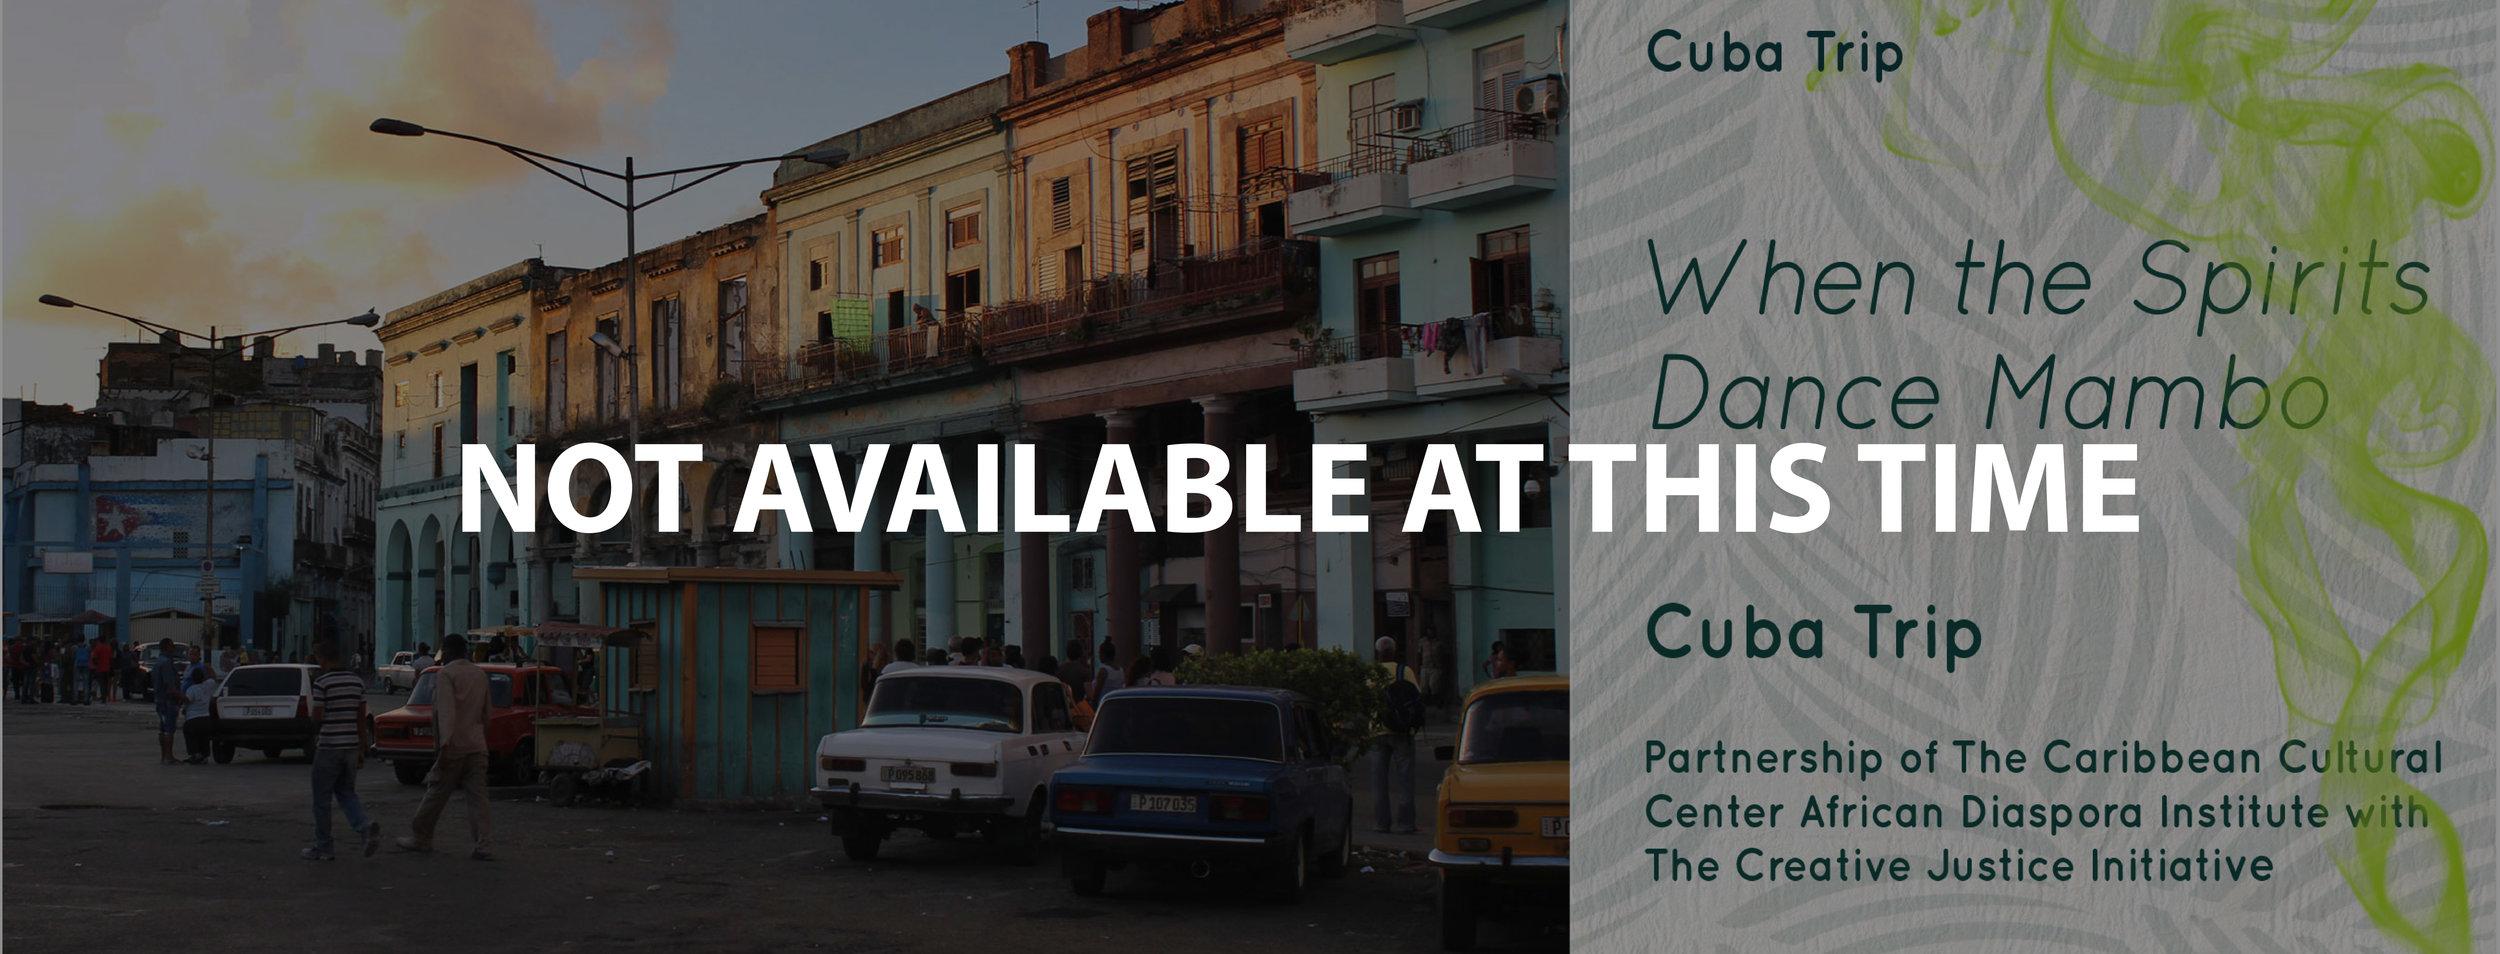 Cuba-Trip_Spirit-Tour-banner_Darl-01.jpg